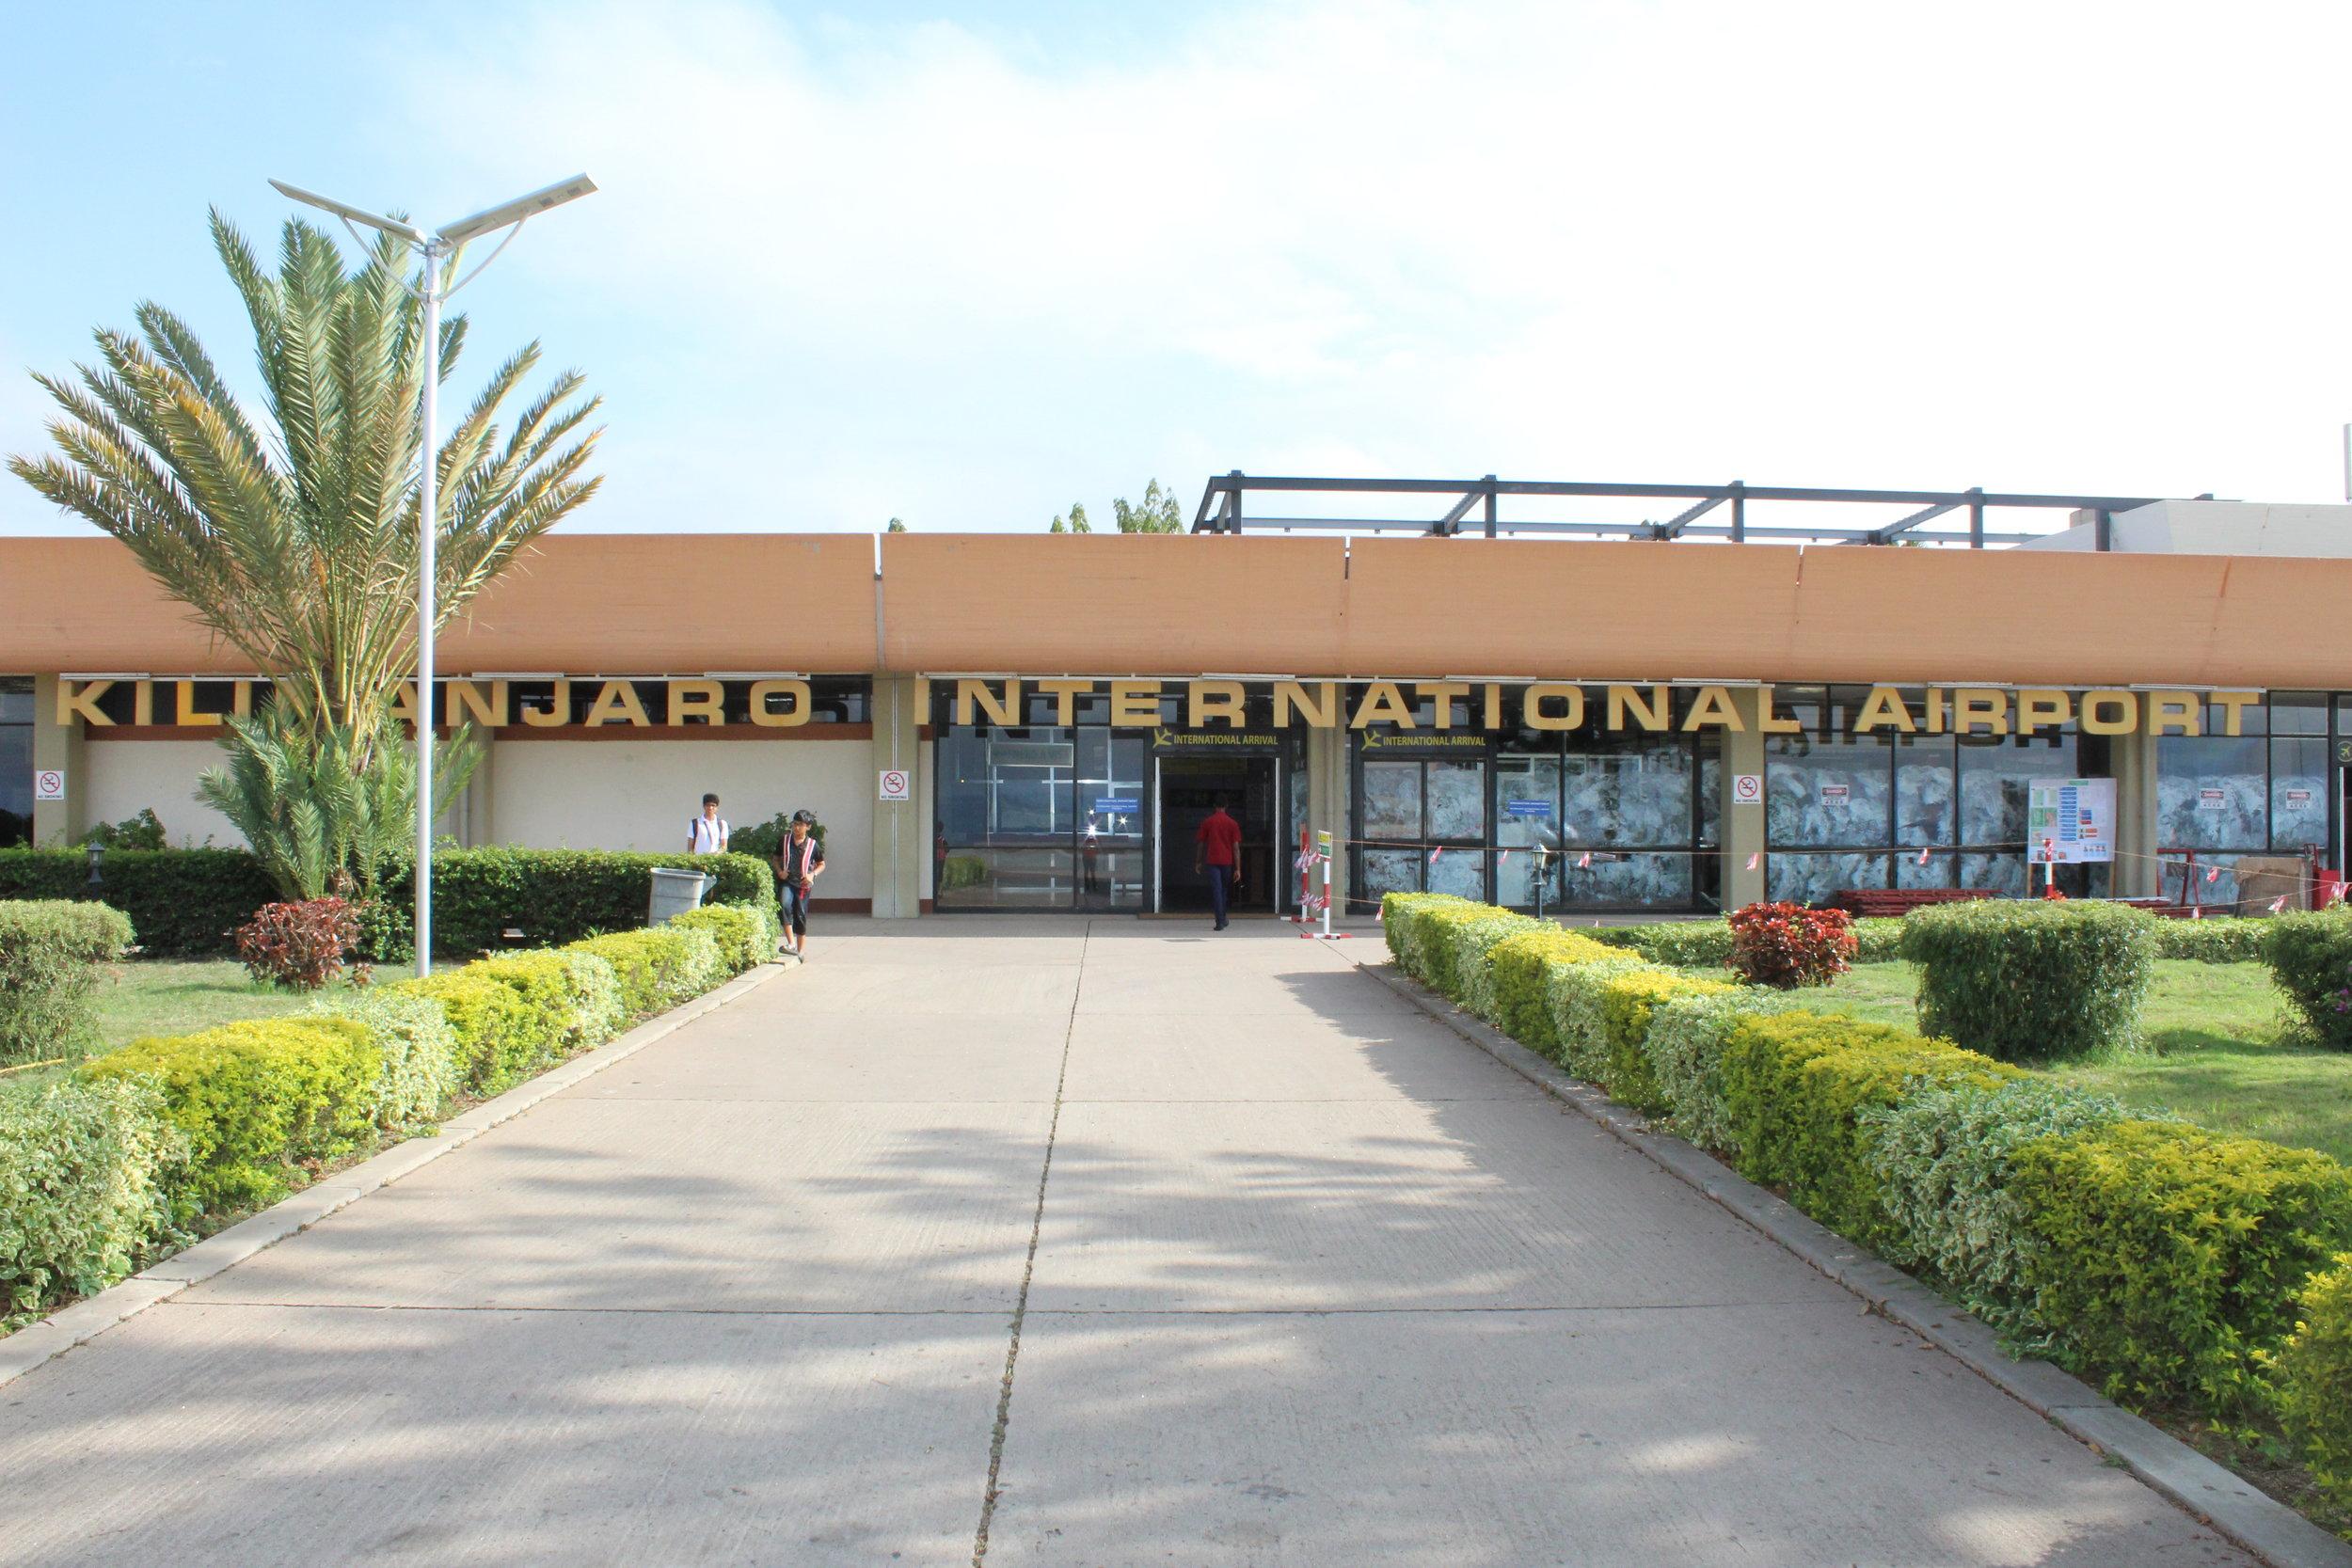 KILIMANJARO INTERNATIONAL AIRPORT - TANZANIA